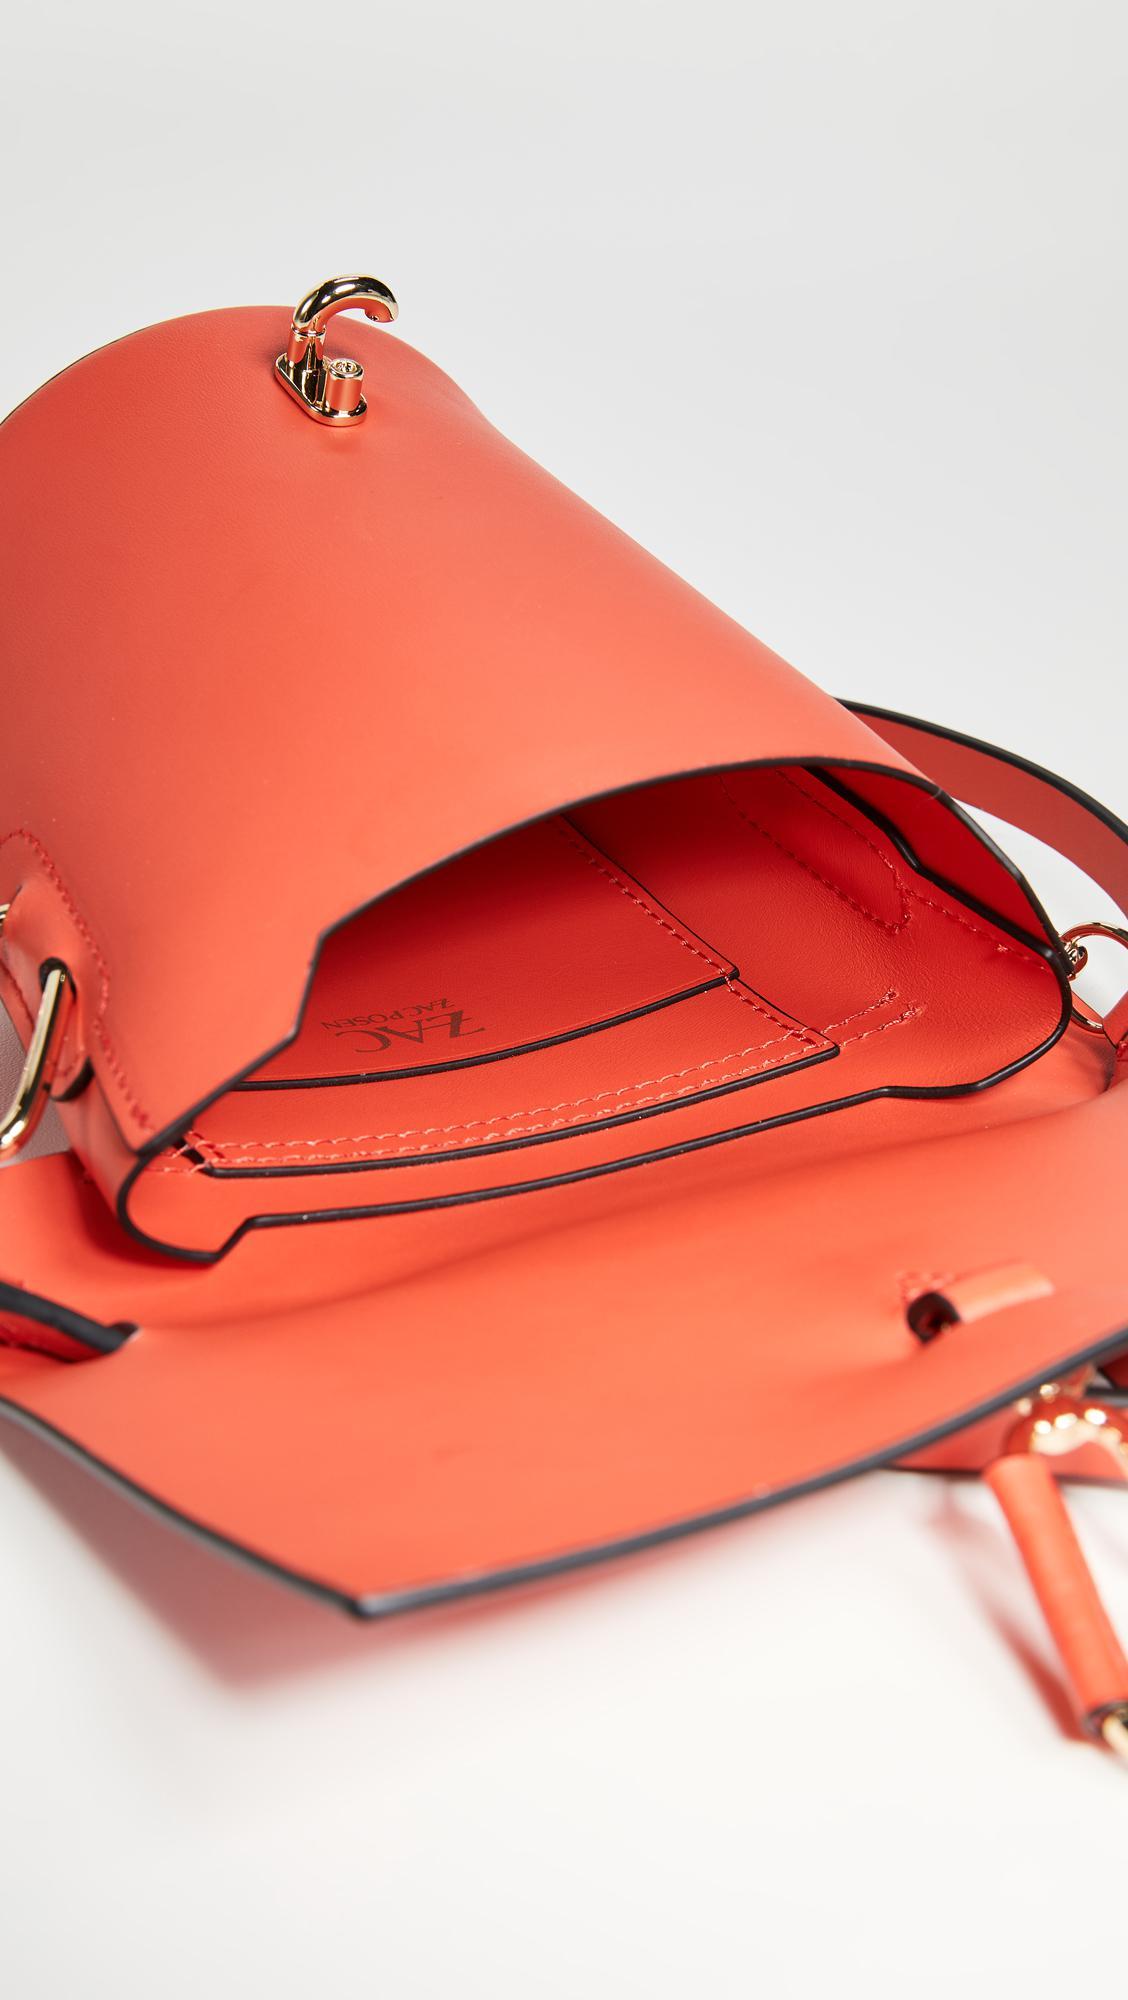 Zac Zac Posen Leather Belay Mini Cross Body Bag in Orange